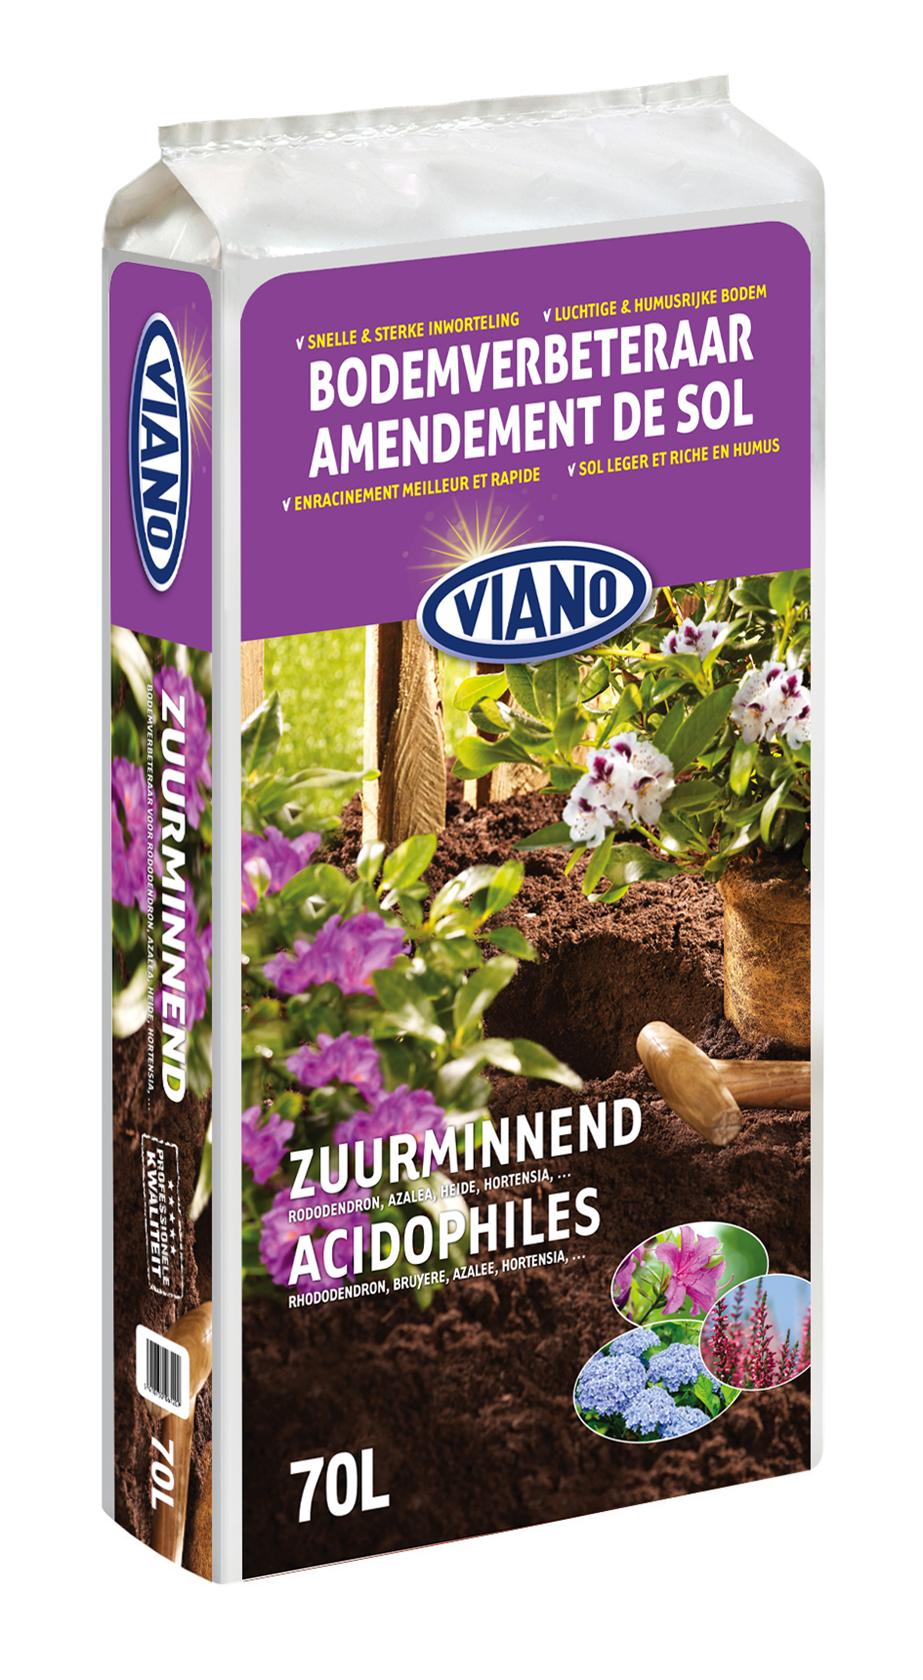 Rododendrons-en-Zuurminnende-planten-bodemverbeteraar-70L-Vianosol